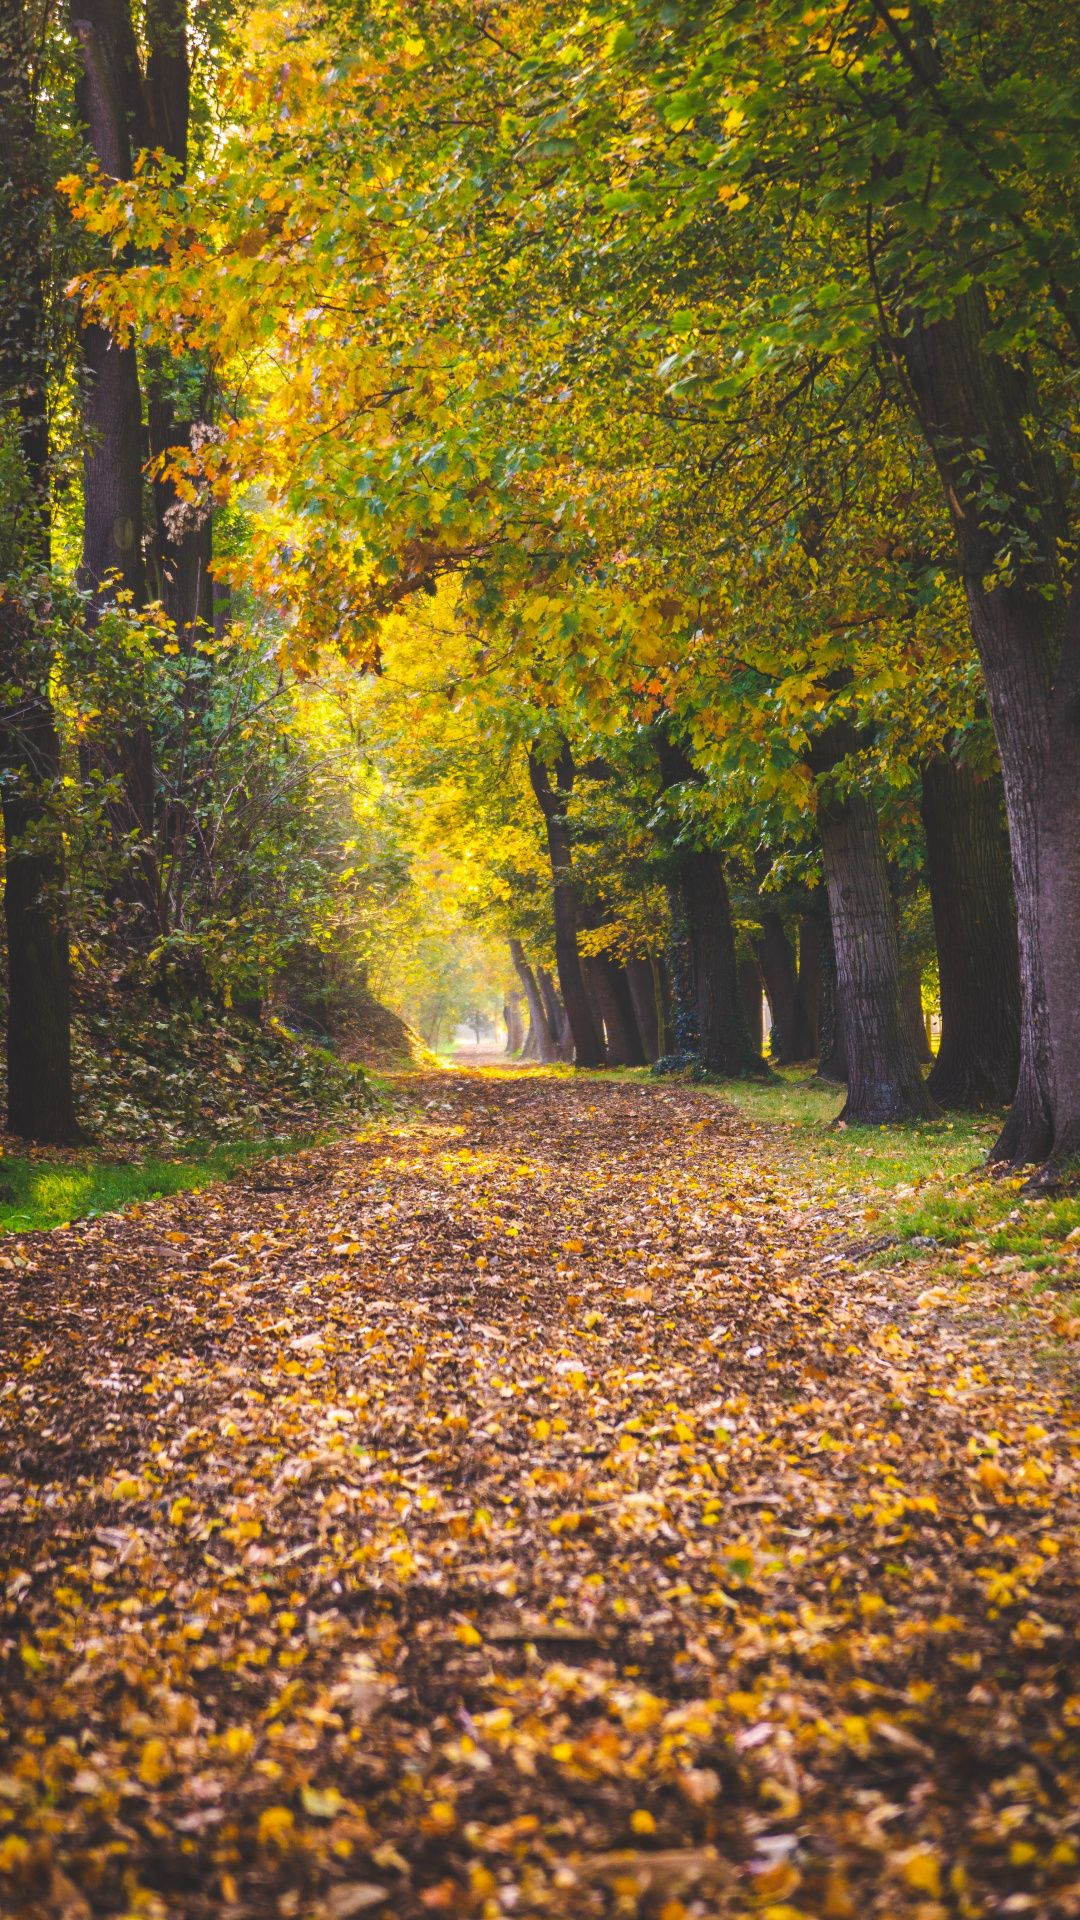 Wallpapers natural landscape, forest, deciduous, leaf